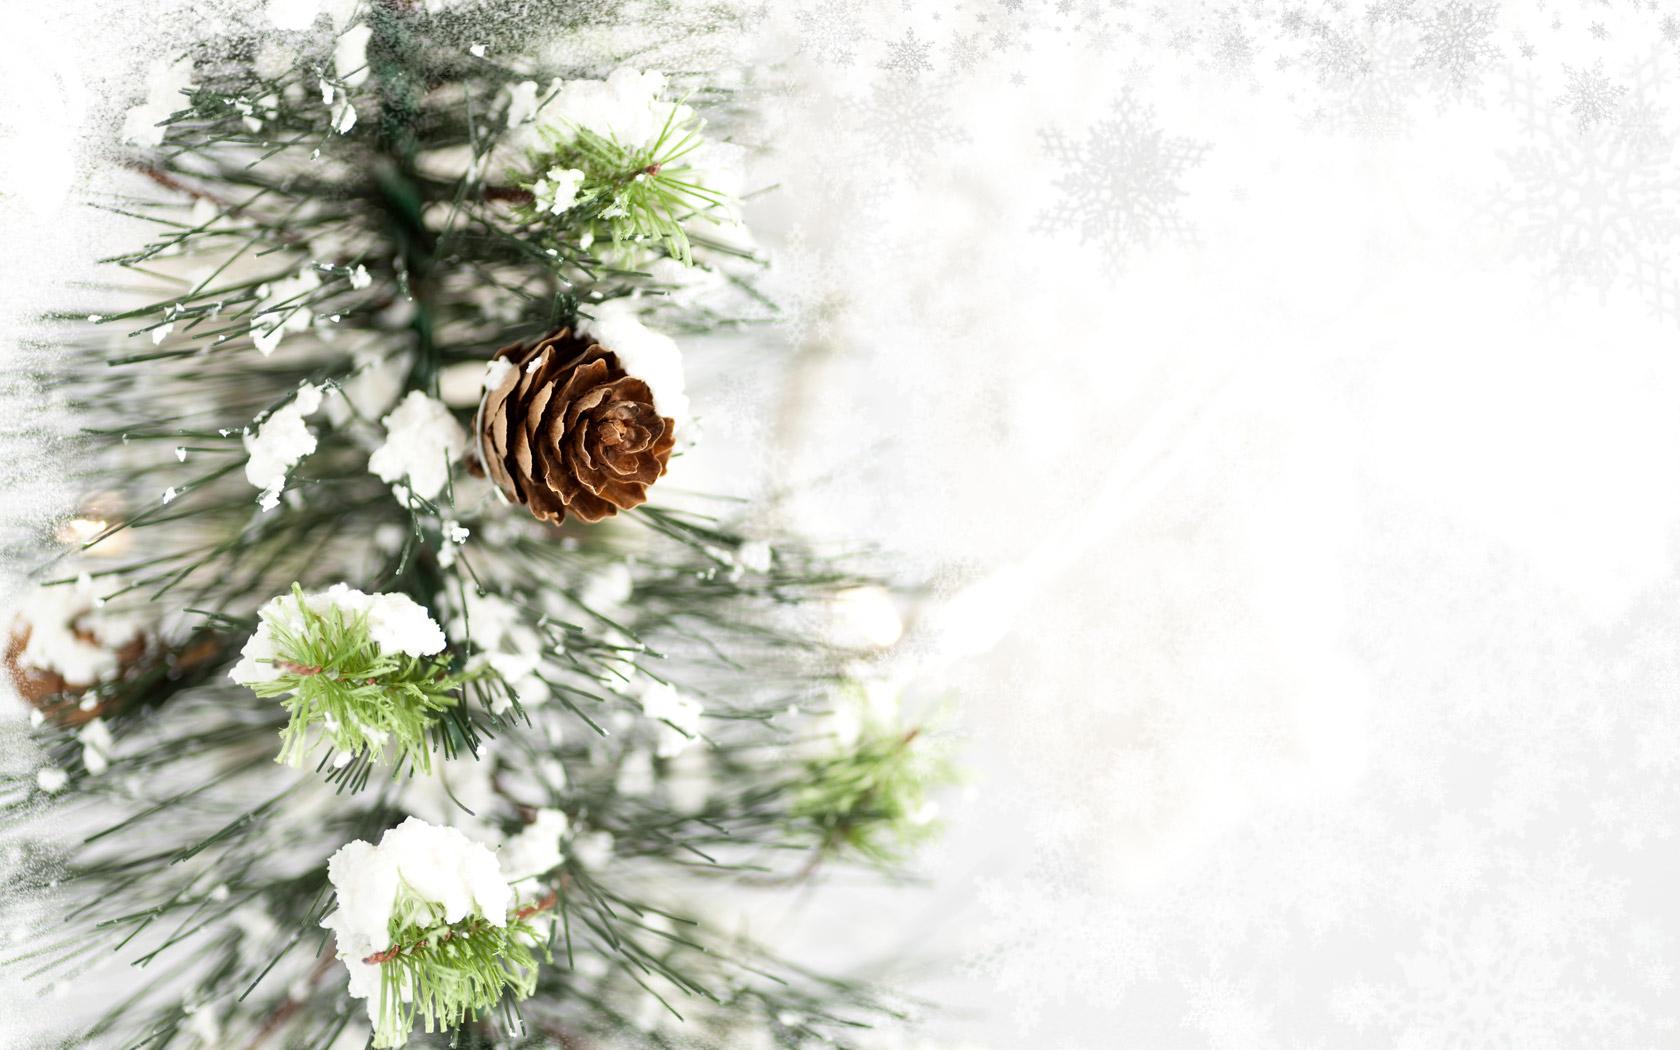 13 wonderful hd pine cone wallpapers